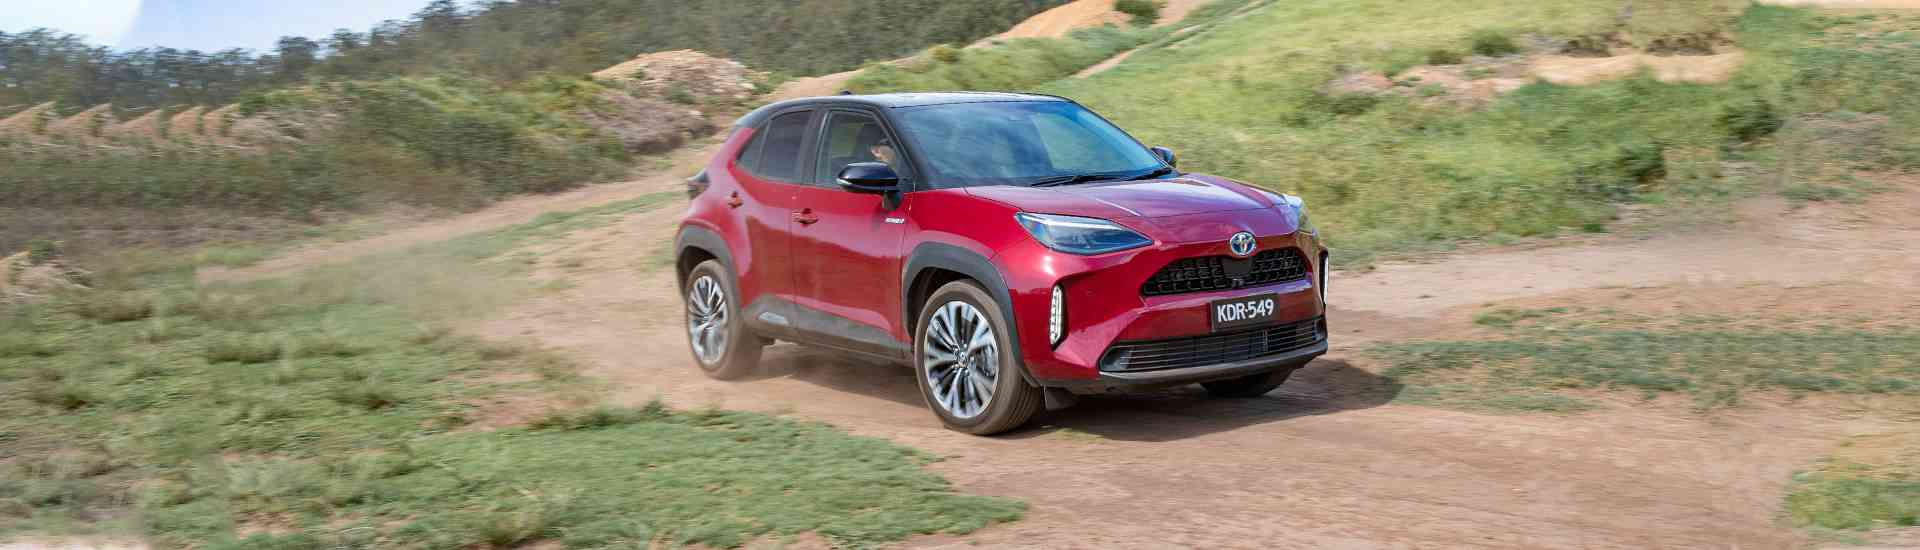 Toyota Yaris Cross 2021 review header 2